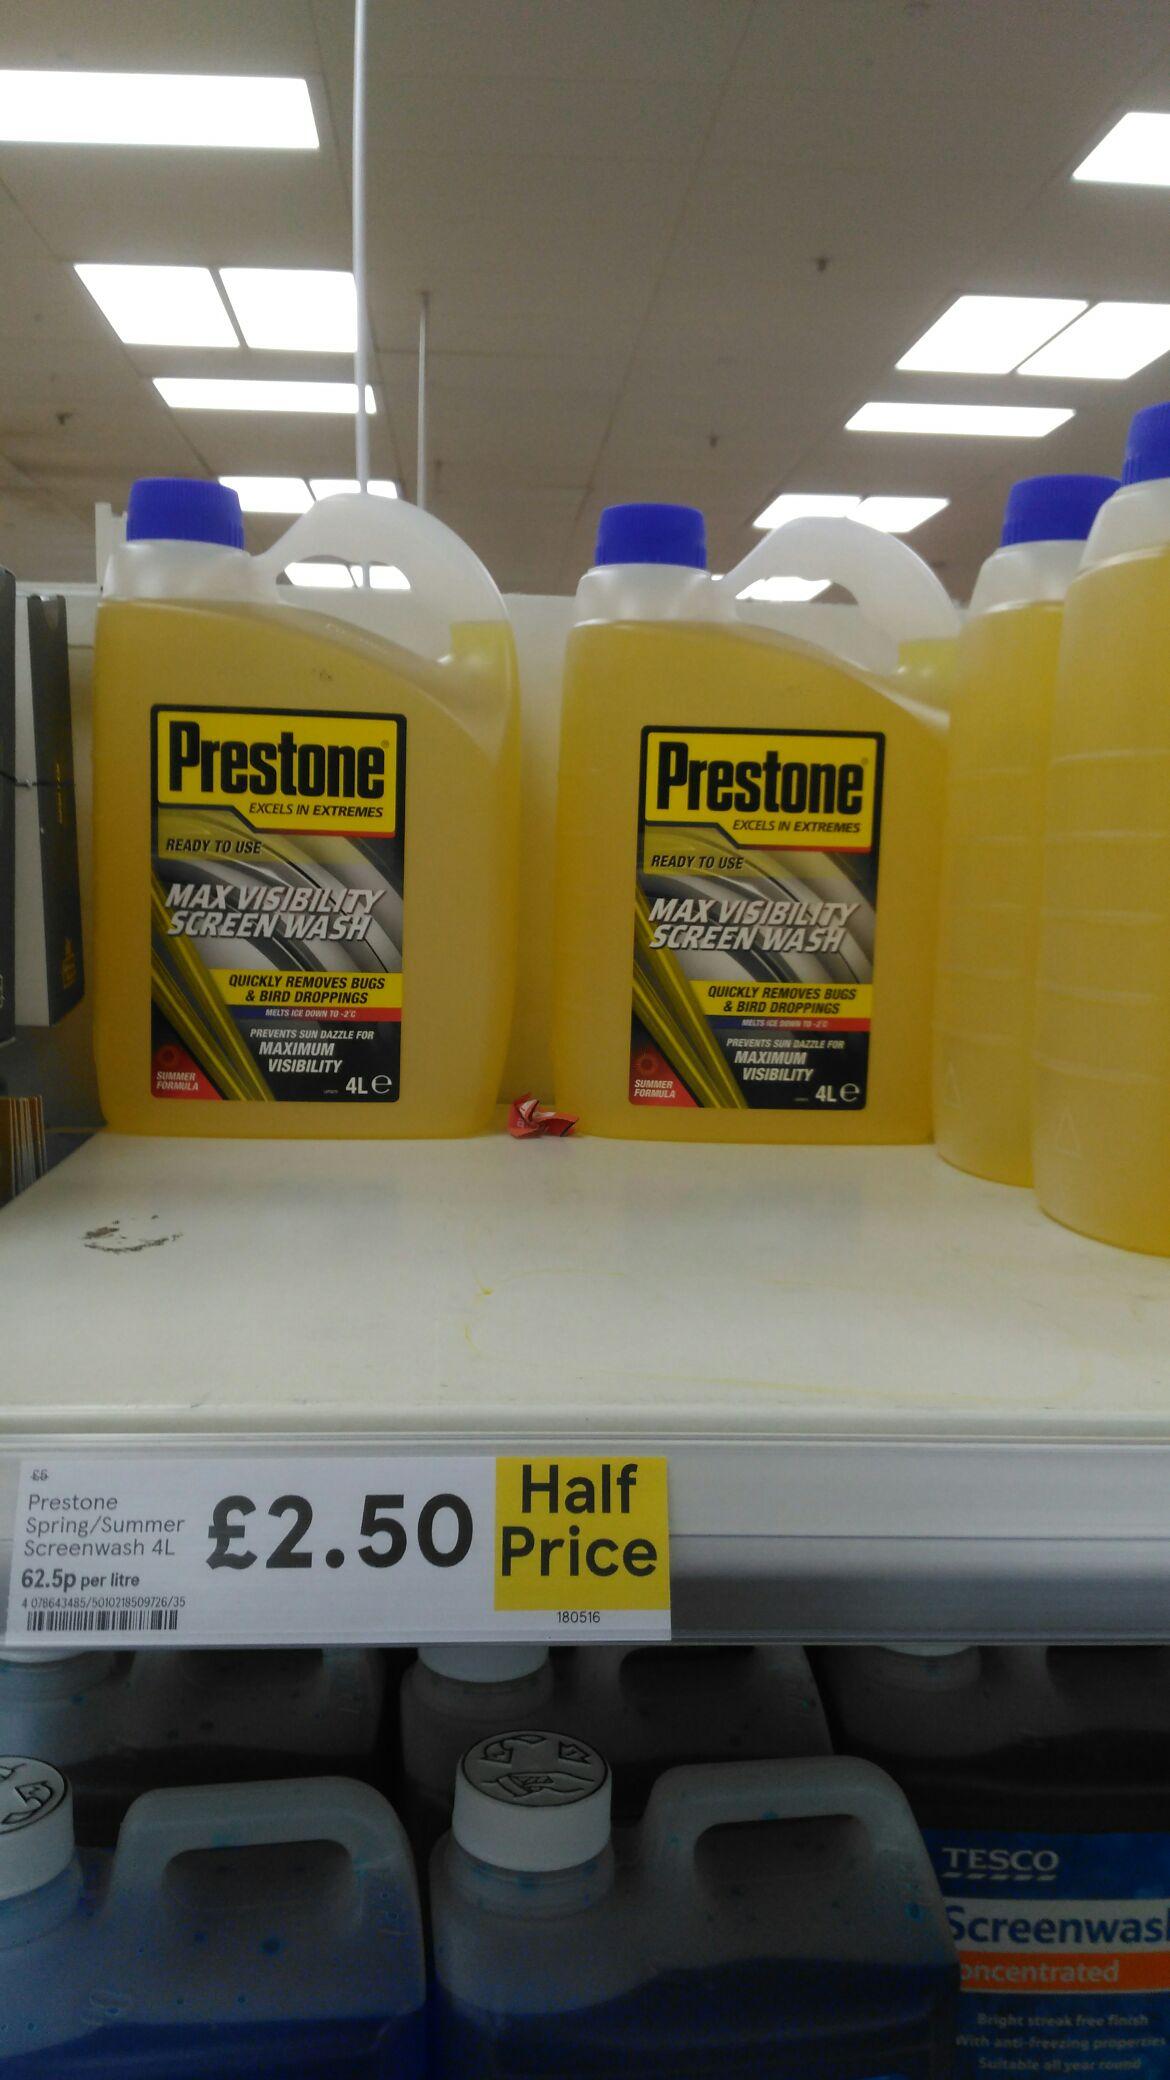 Prestone car screen wash 4 litres half price  £2.50 @ Tesco instore